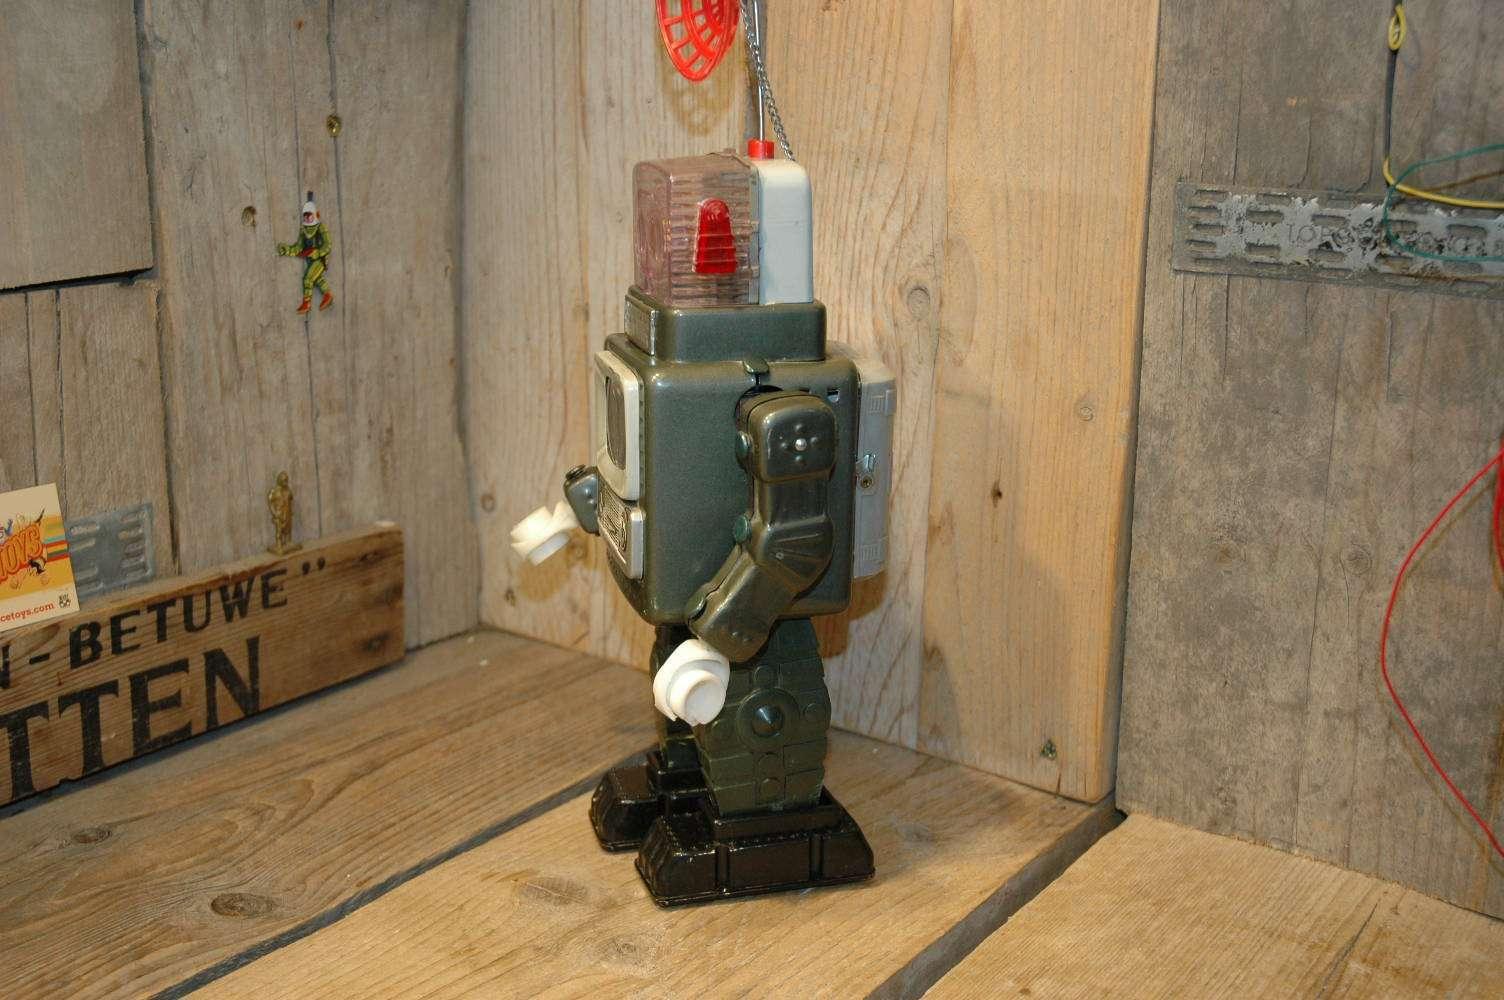 Alps-television spaceman robot